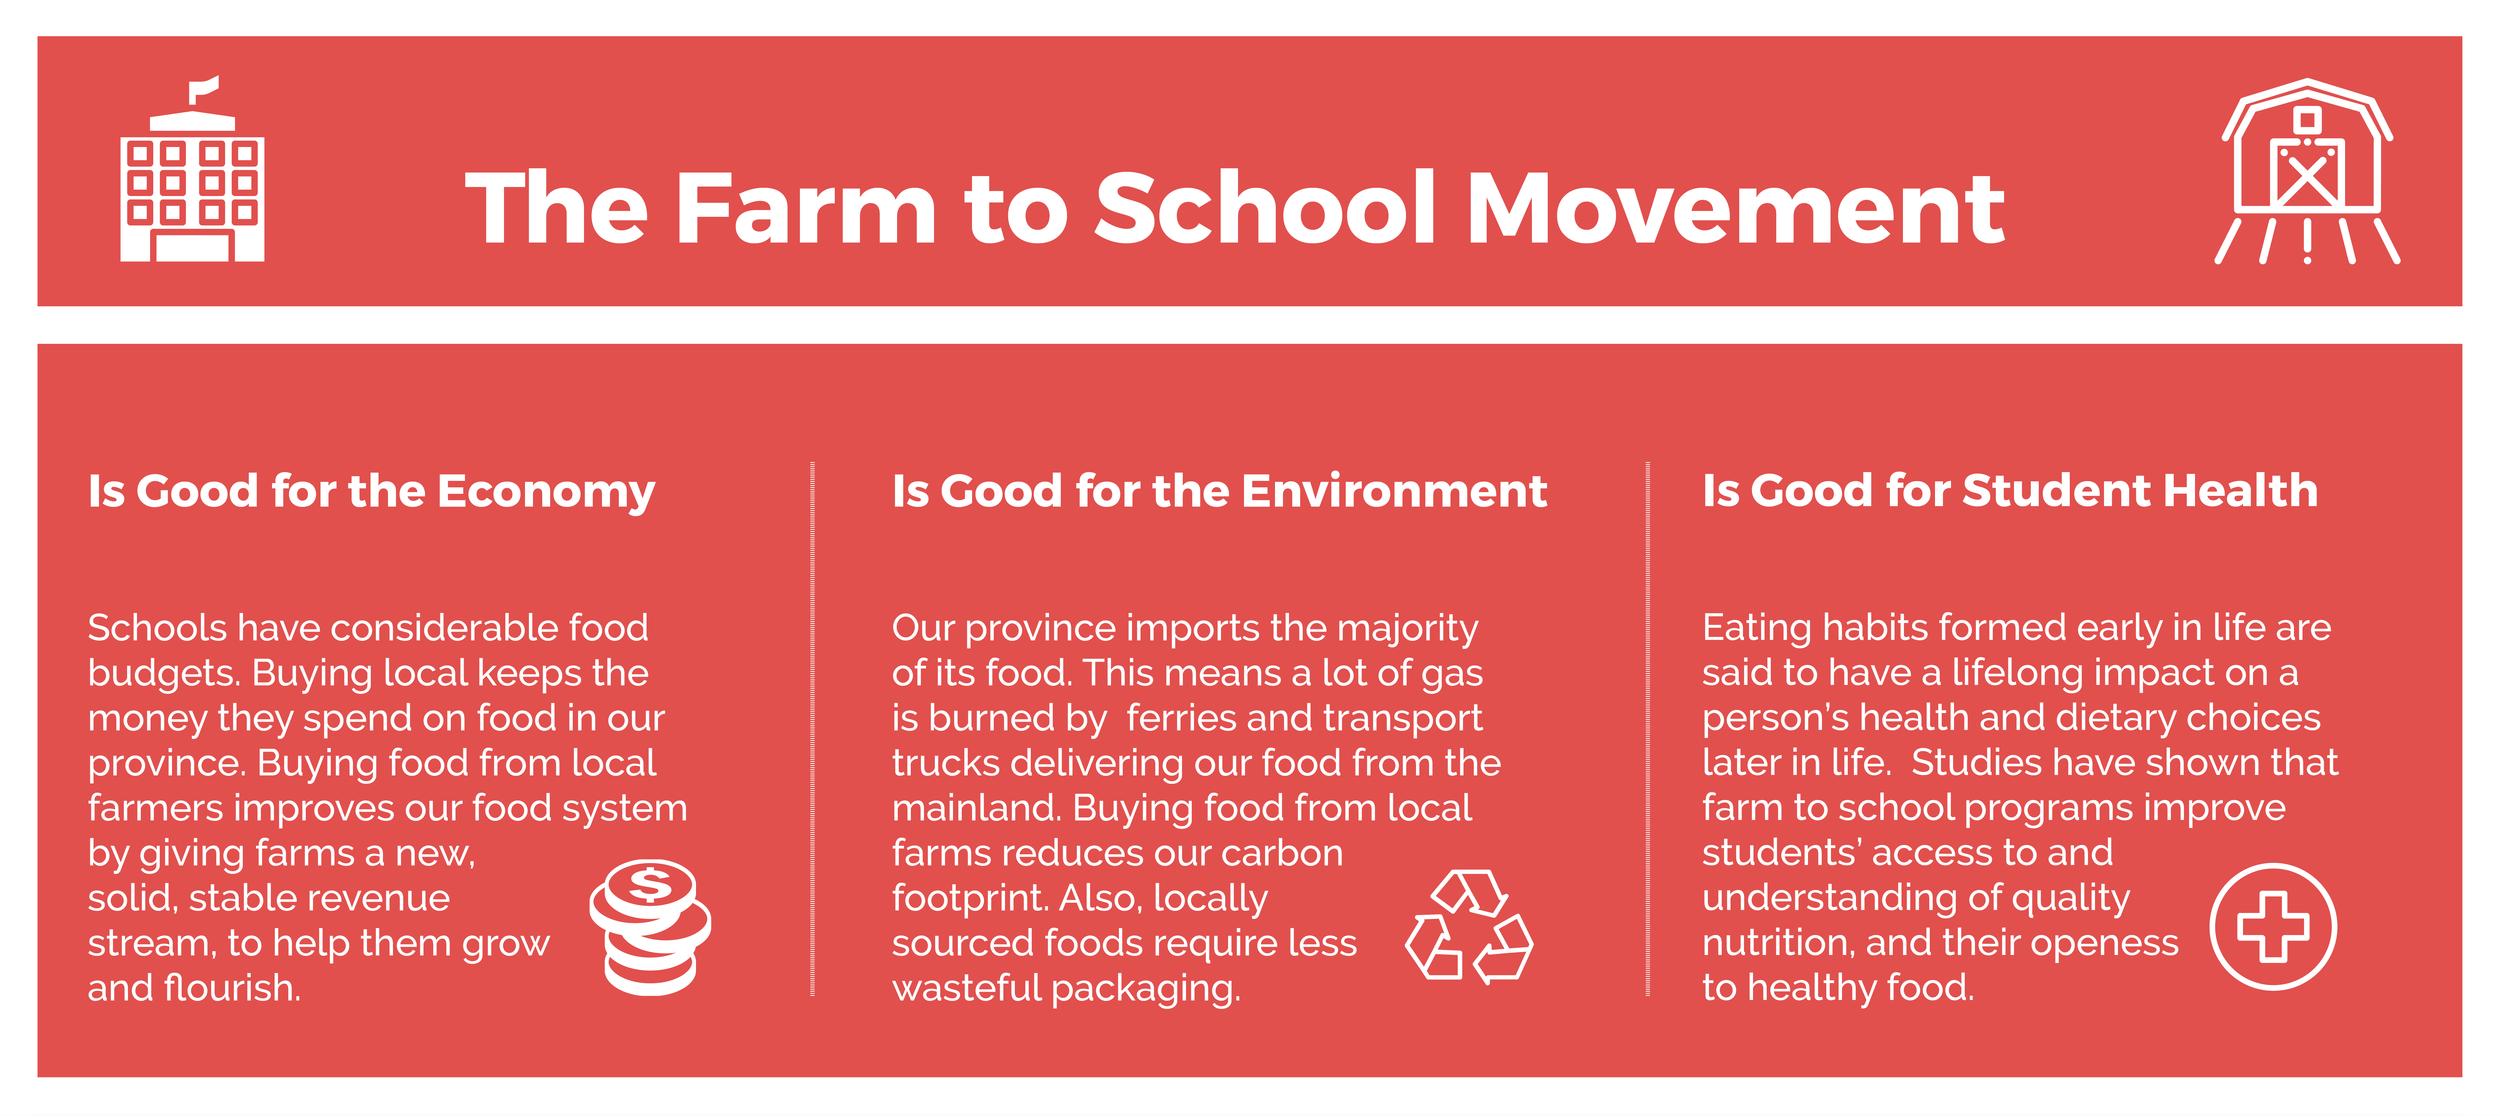 Farm to School benefits 2.png